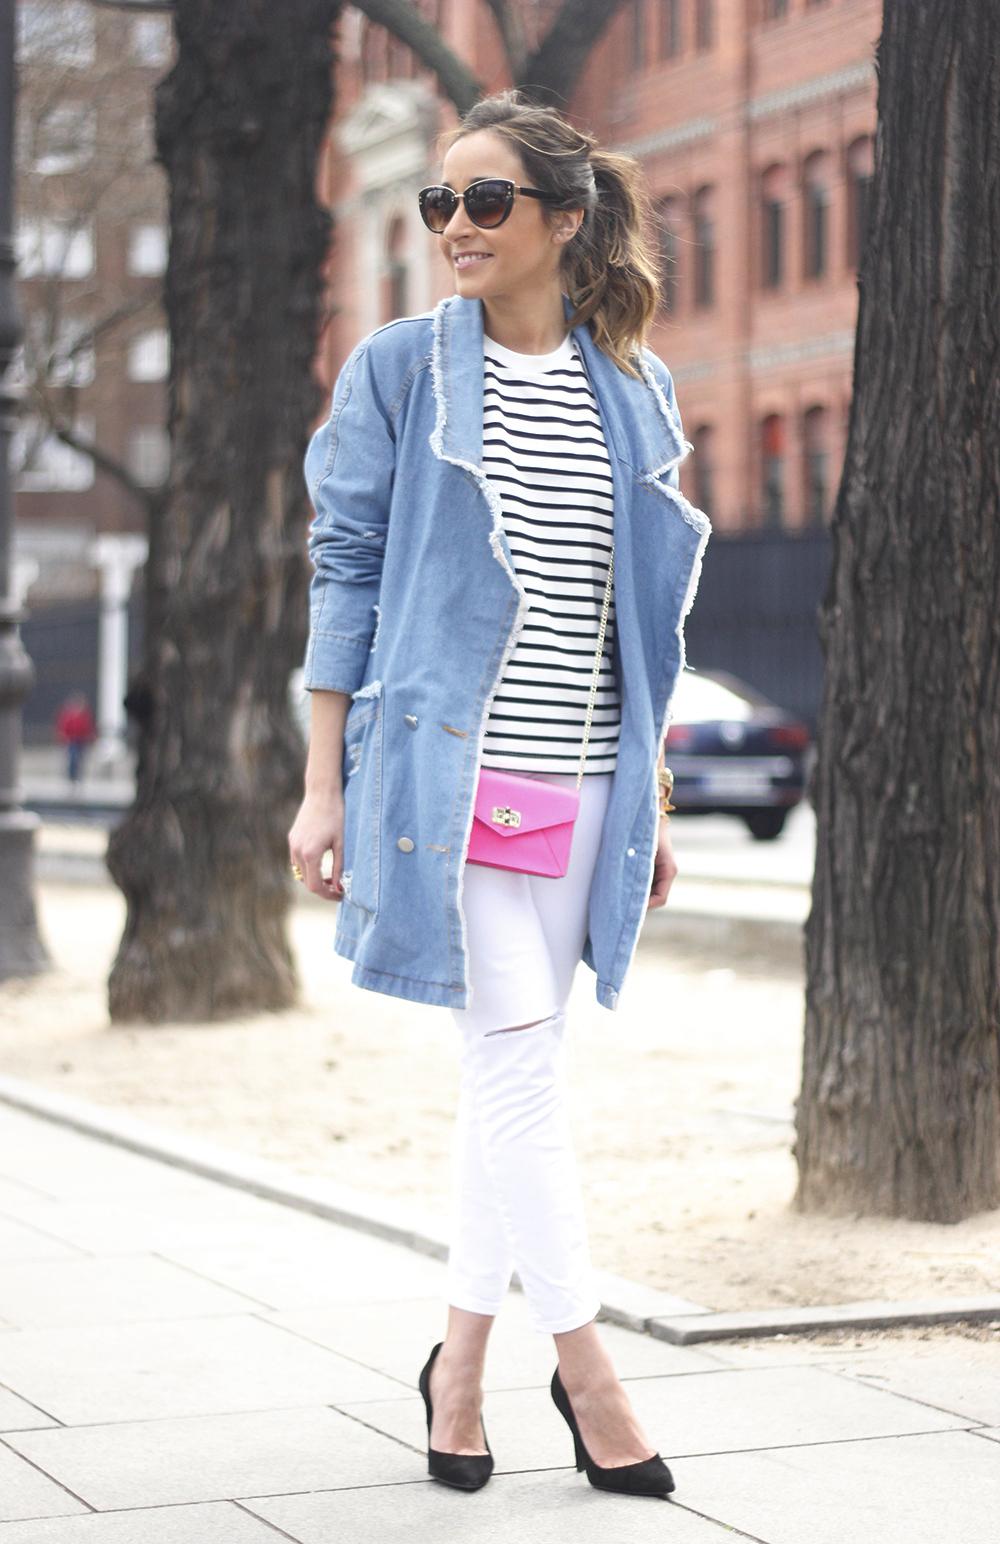 Stripes and Denim Coat Gloria Ortiz Heels Accessories Sunnies Outfit20